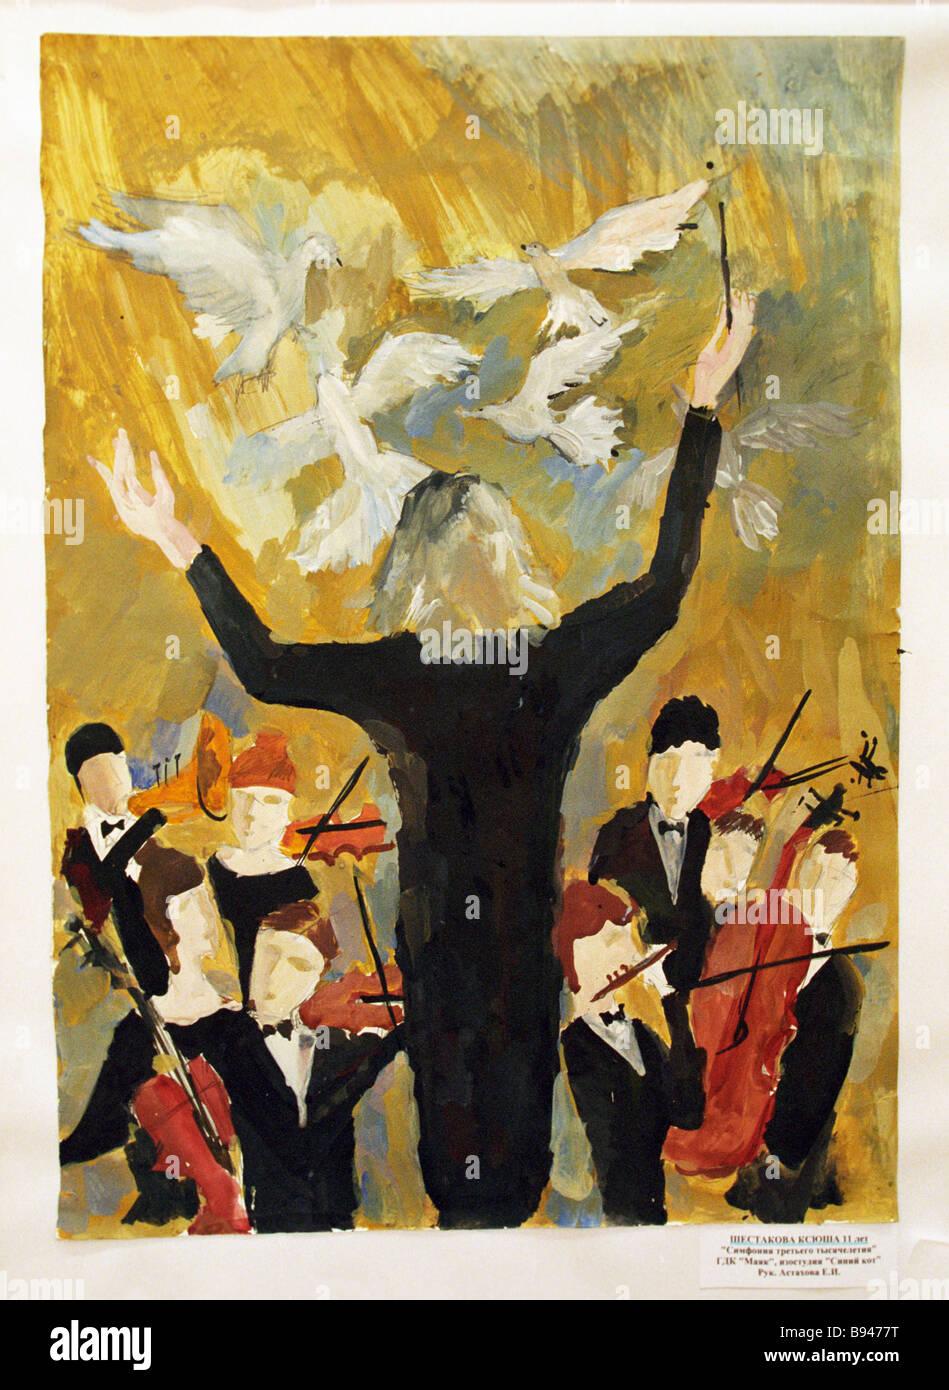 Eleven year old Kseniya Shestakova s drawing Third Millennium Symphony at the 9th international children s fine - Stock Image